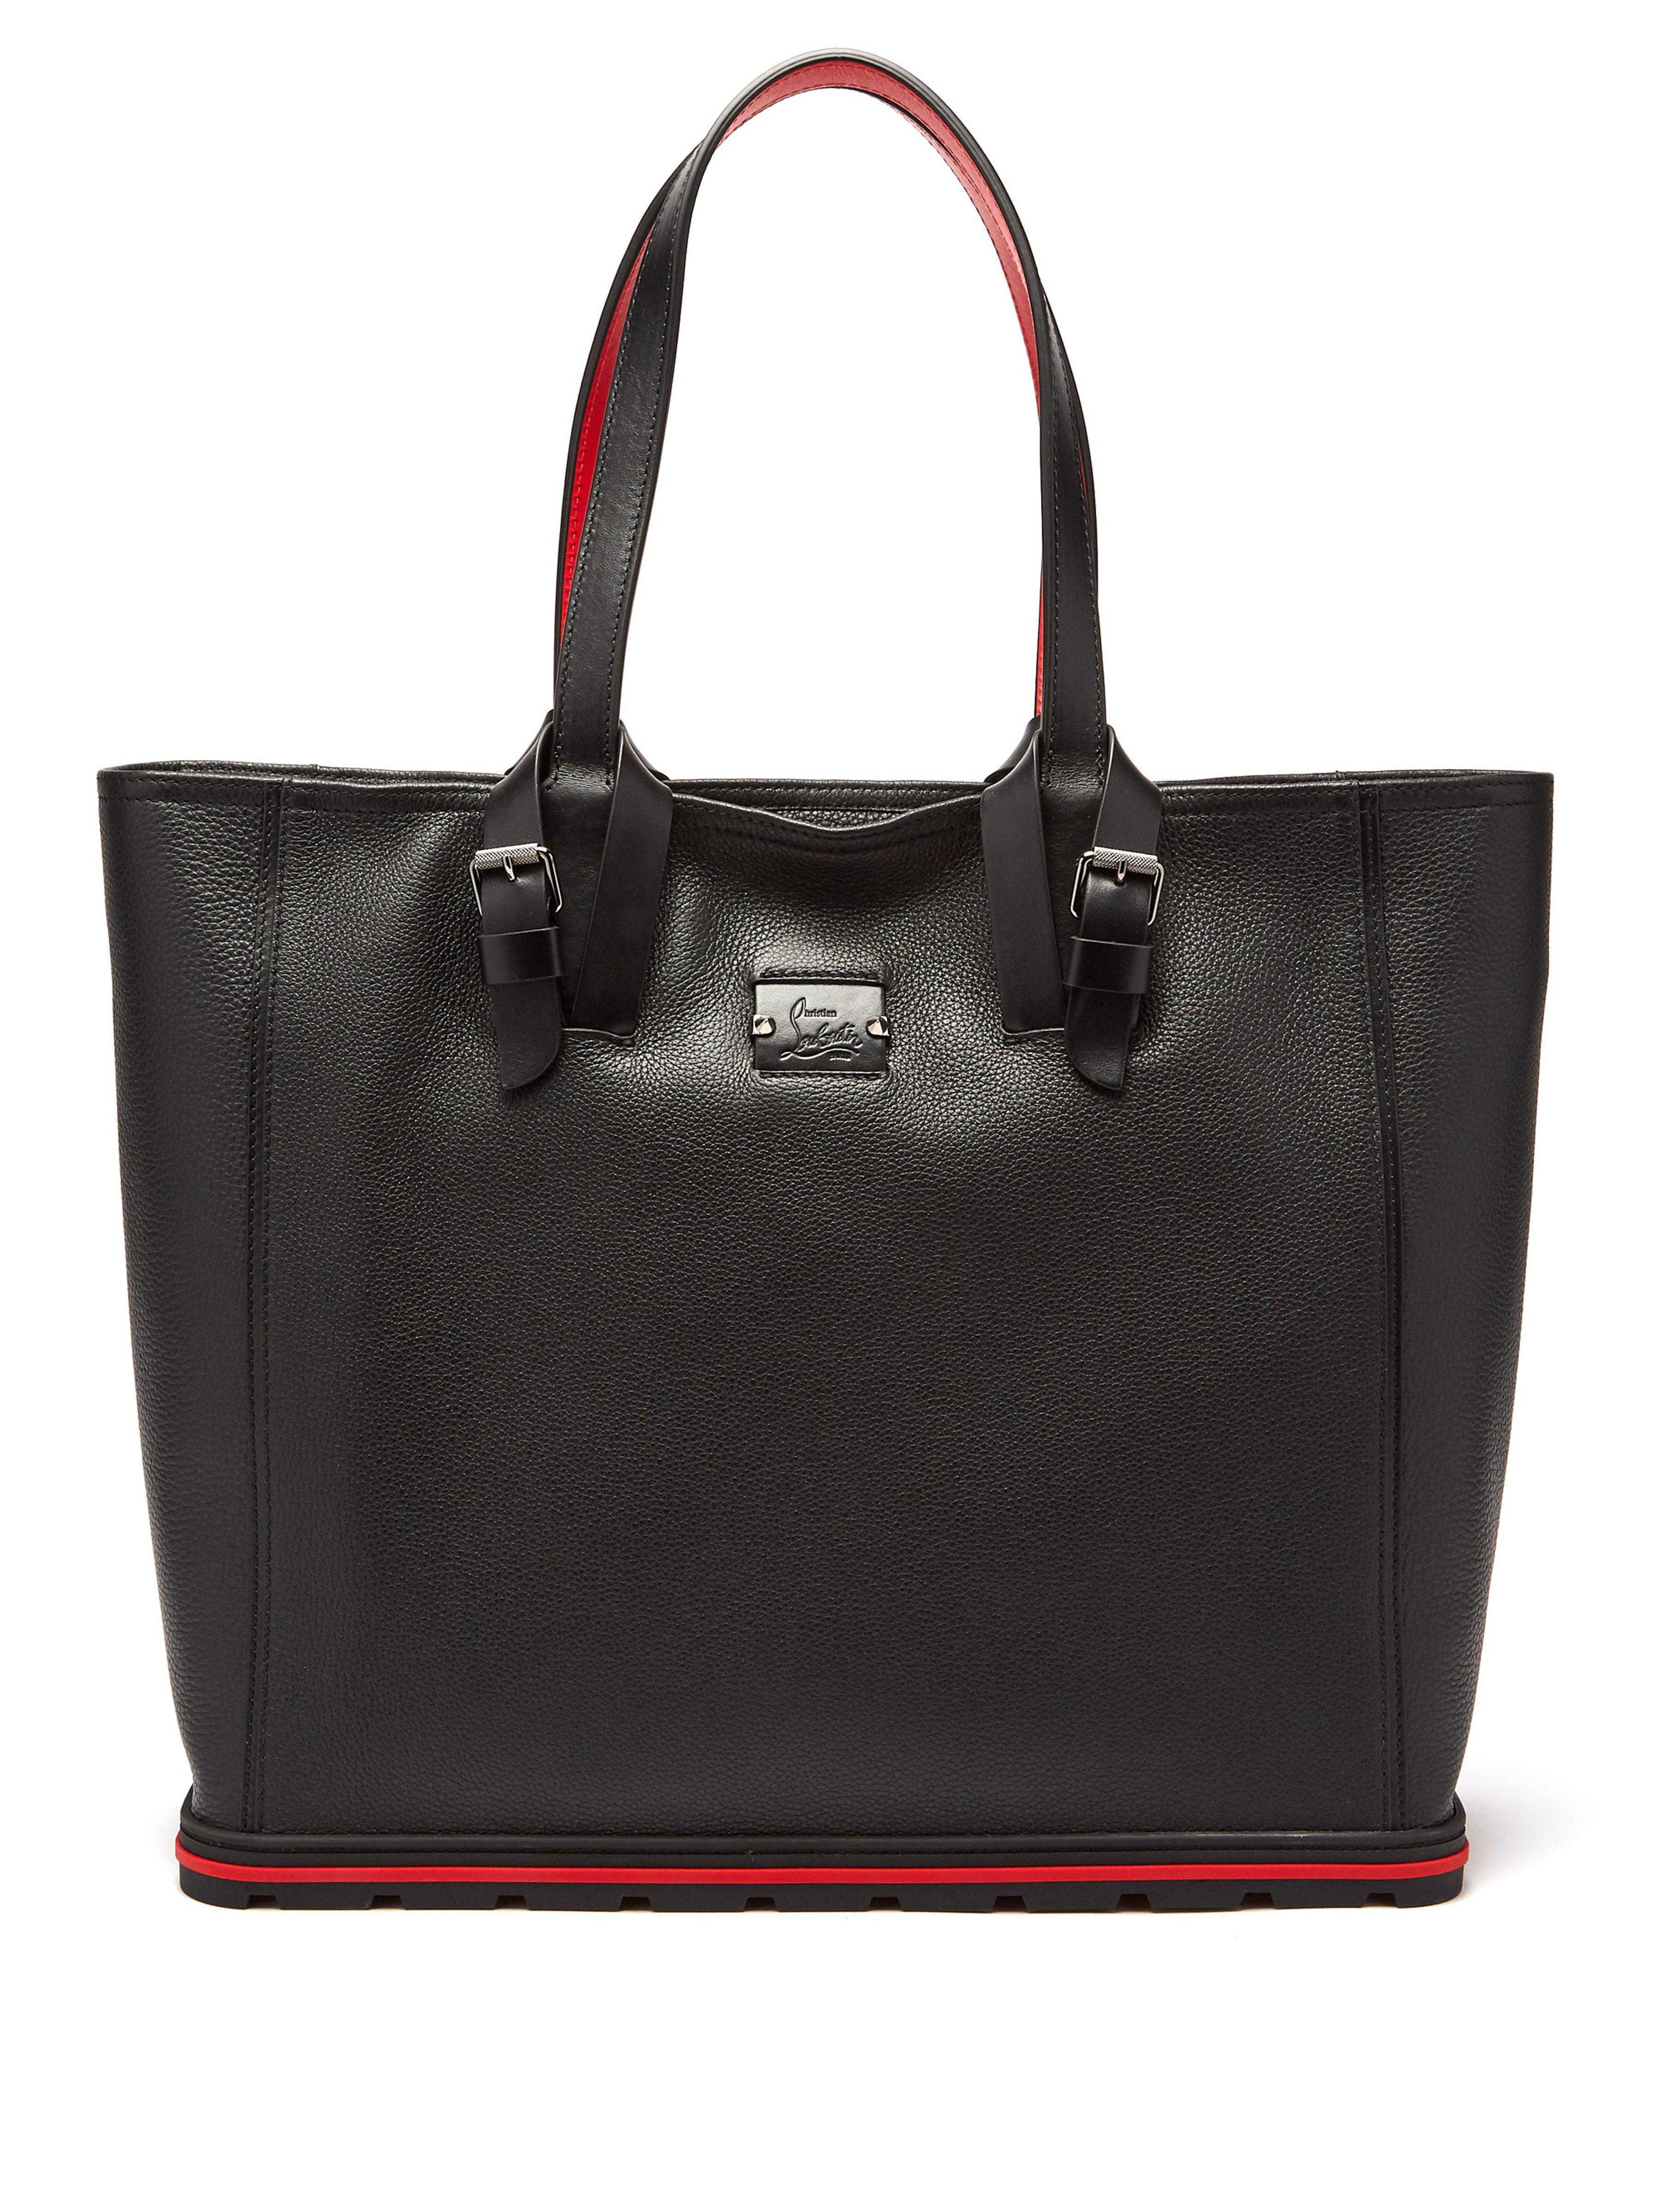 2c244a44d5cd Christian Louboutin - Black Kabiker Leather Tote Bag for Men - Lyst. View  fullscreen